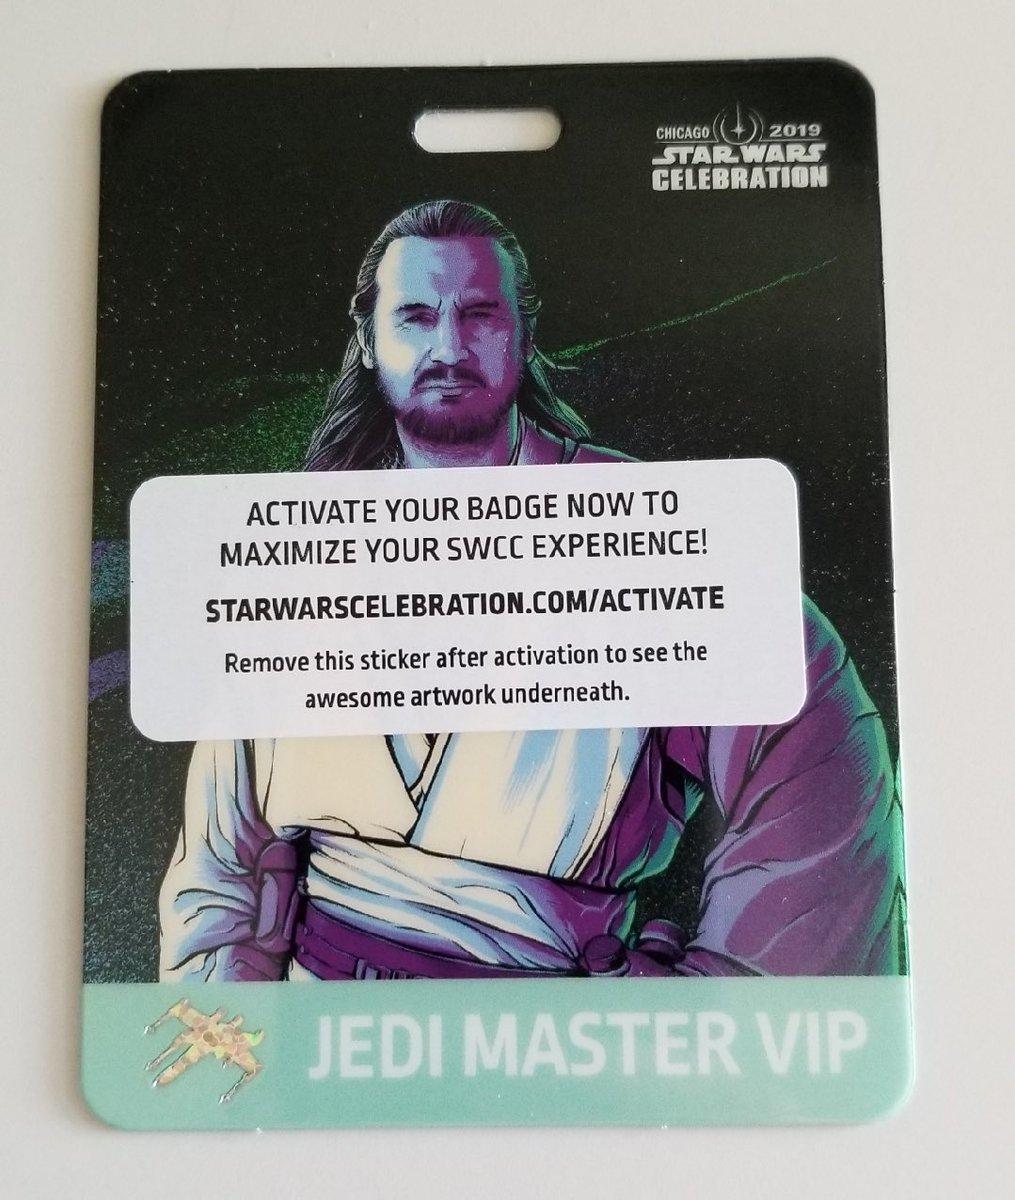 Star Wars Celebration Chicago 2019 Jedi Master Badge